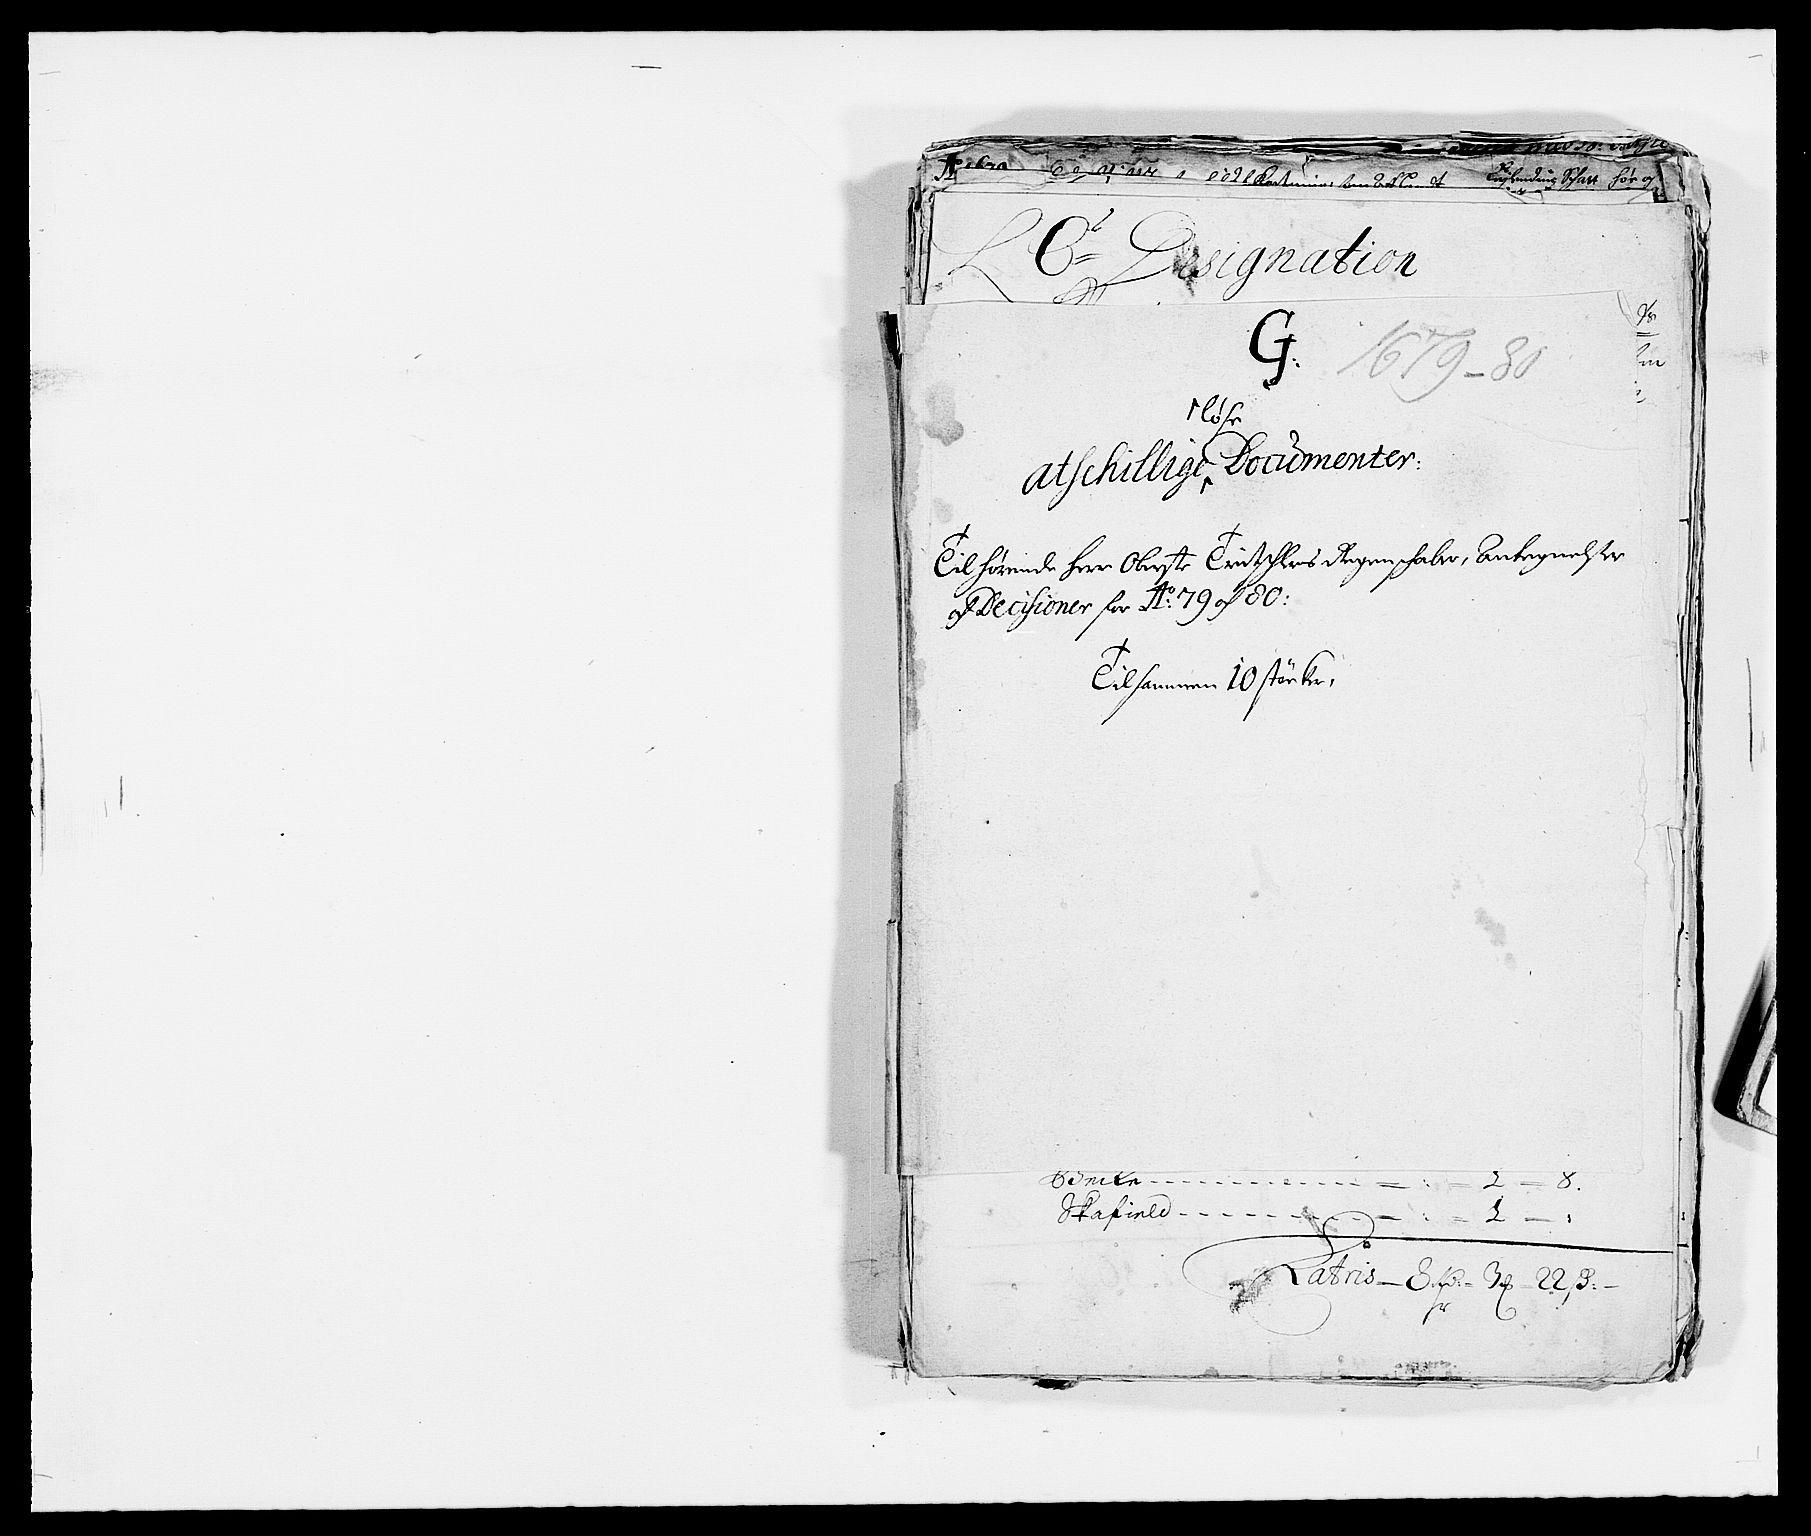 RA, Rentekammeret inntil 1814, Reviderte regnskaper, Fogderegnskap, R32/L1849: Fogderegnskap Jarlsberg grevskap, 1679-1680, s. 186